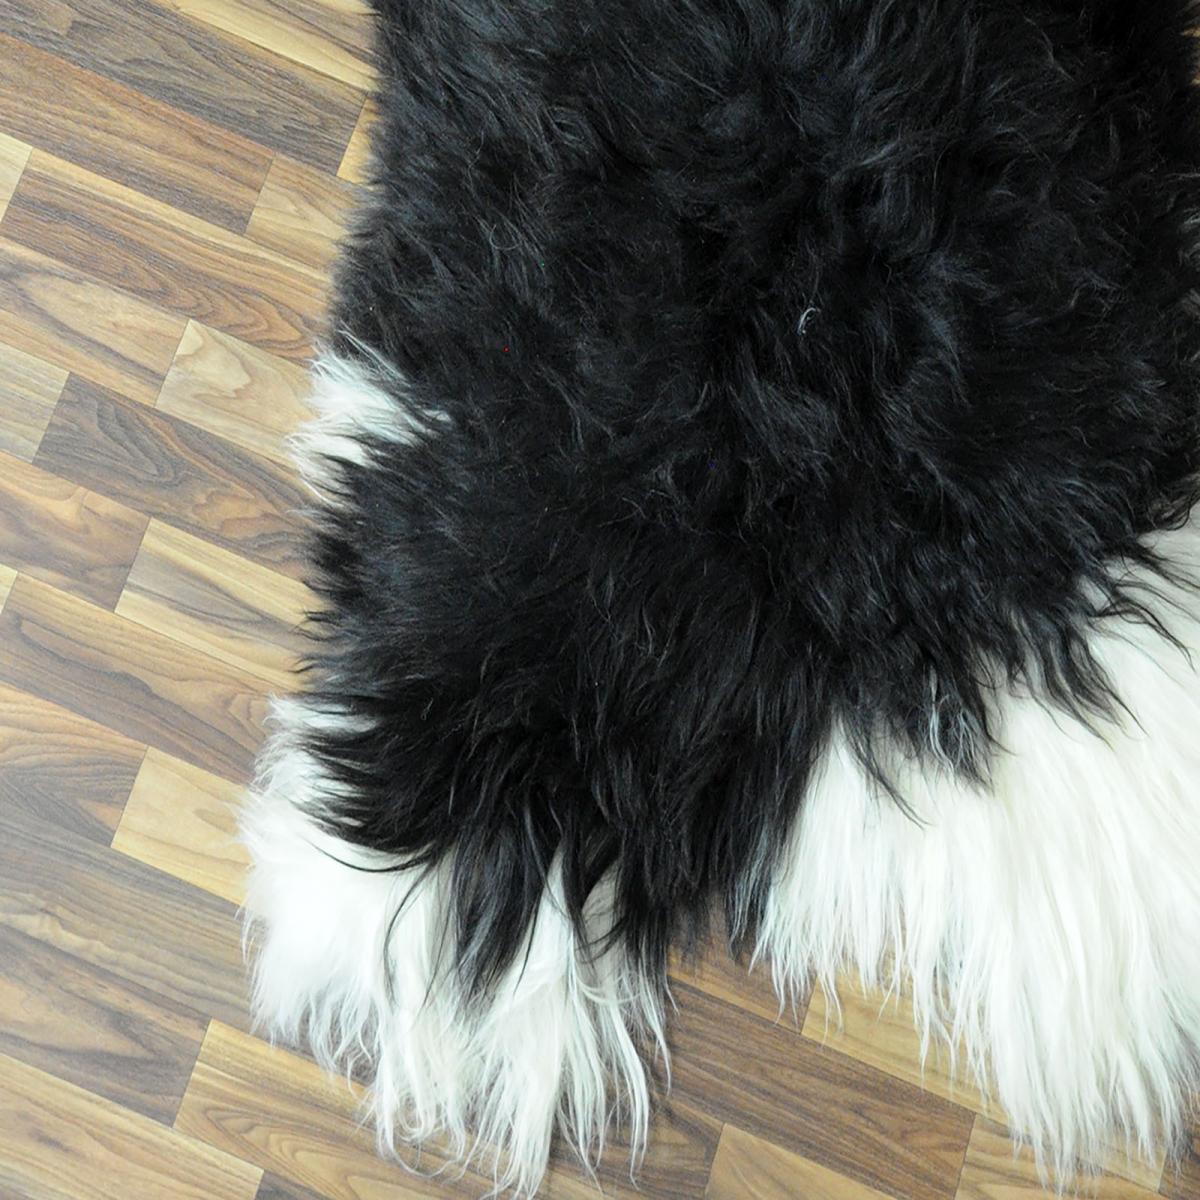 schaffell lammfell fell pelz dunkel grau 100x70 auflage 4258 4258. Black Bedroom Furniture Sets. Home Design Ideas